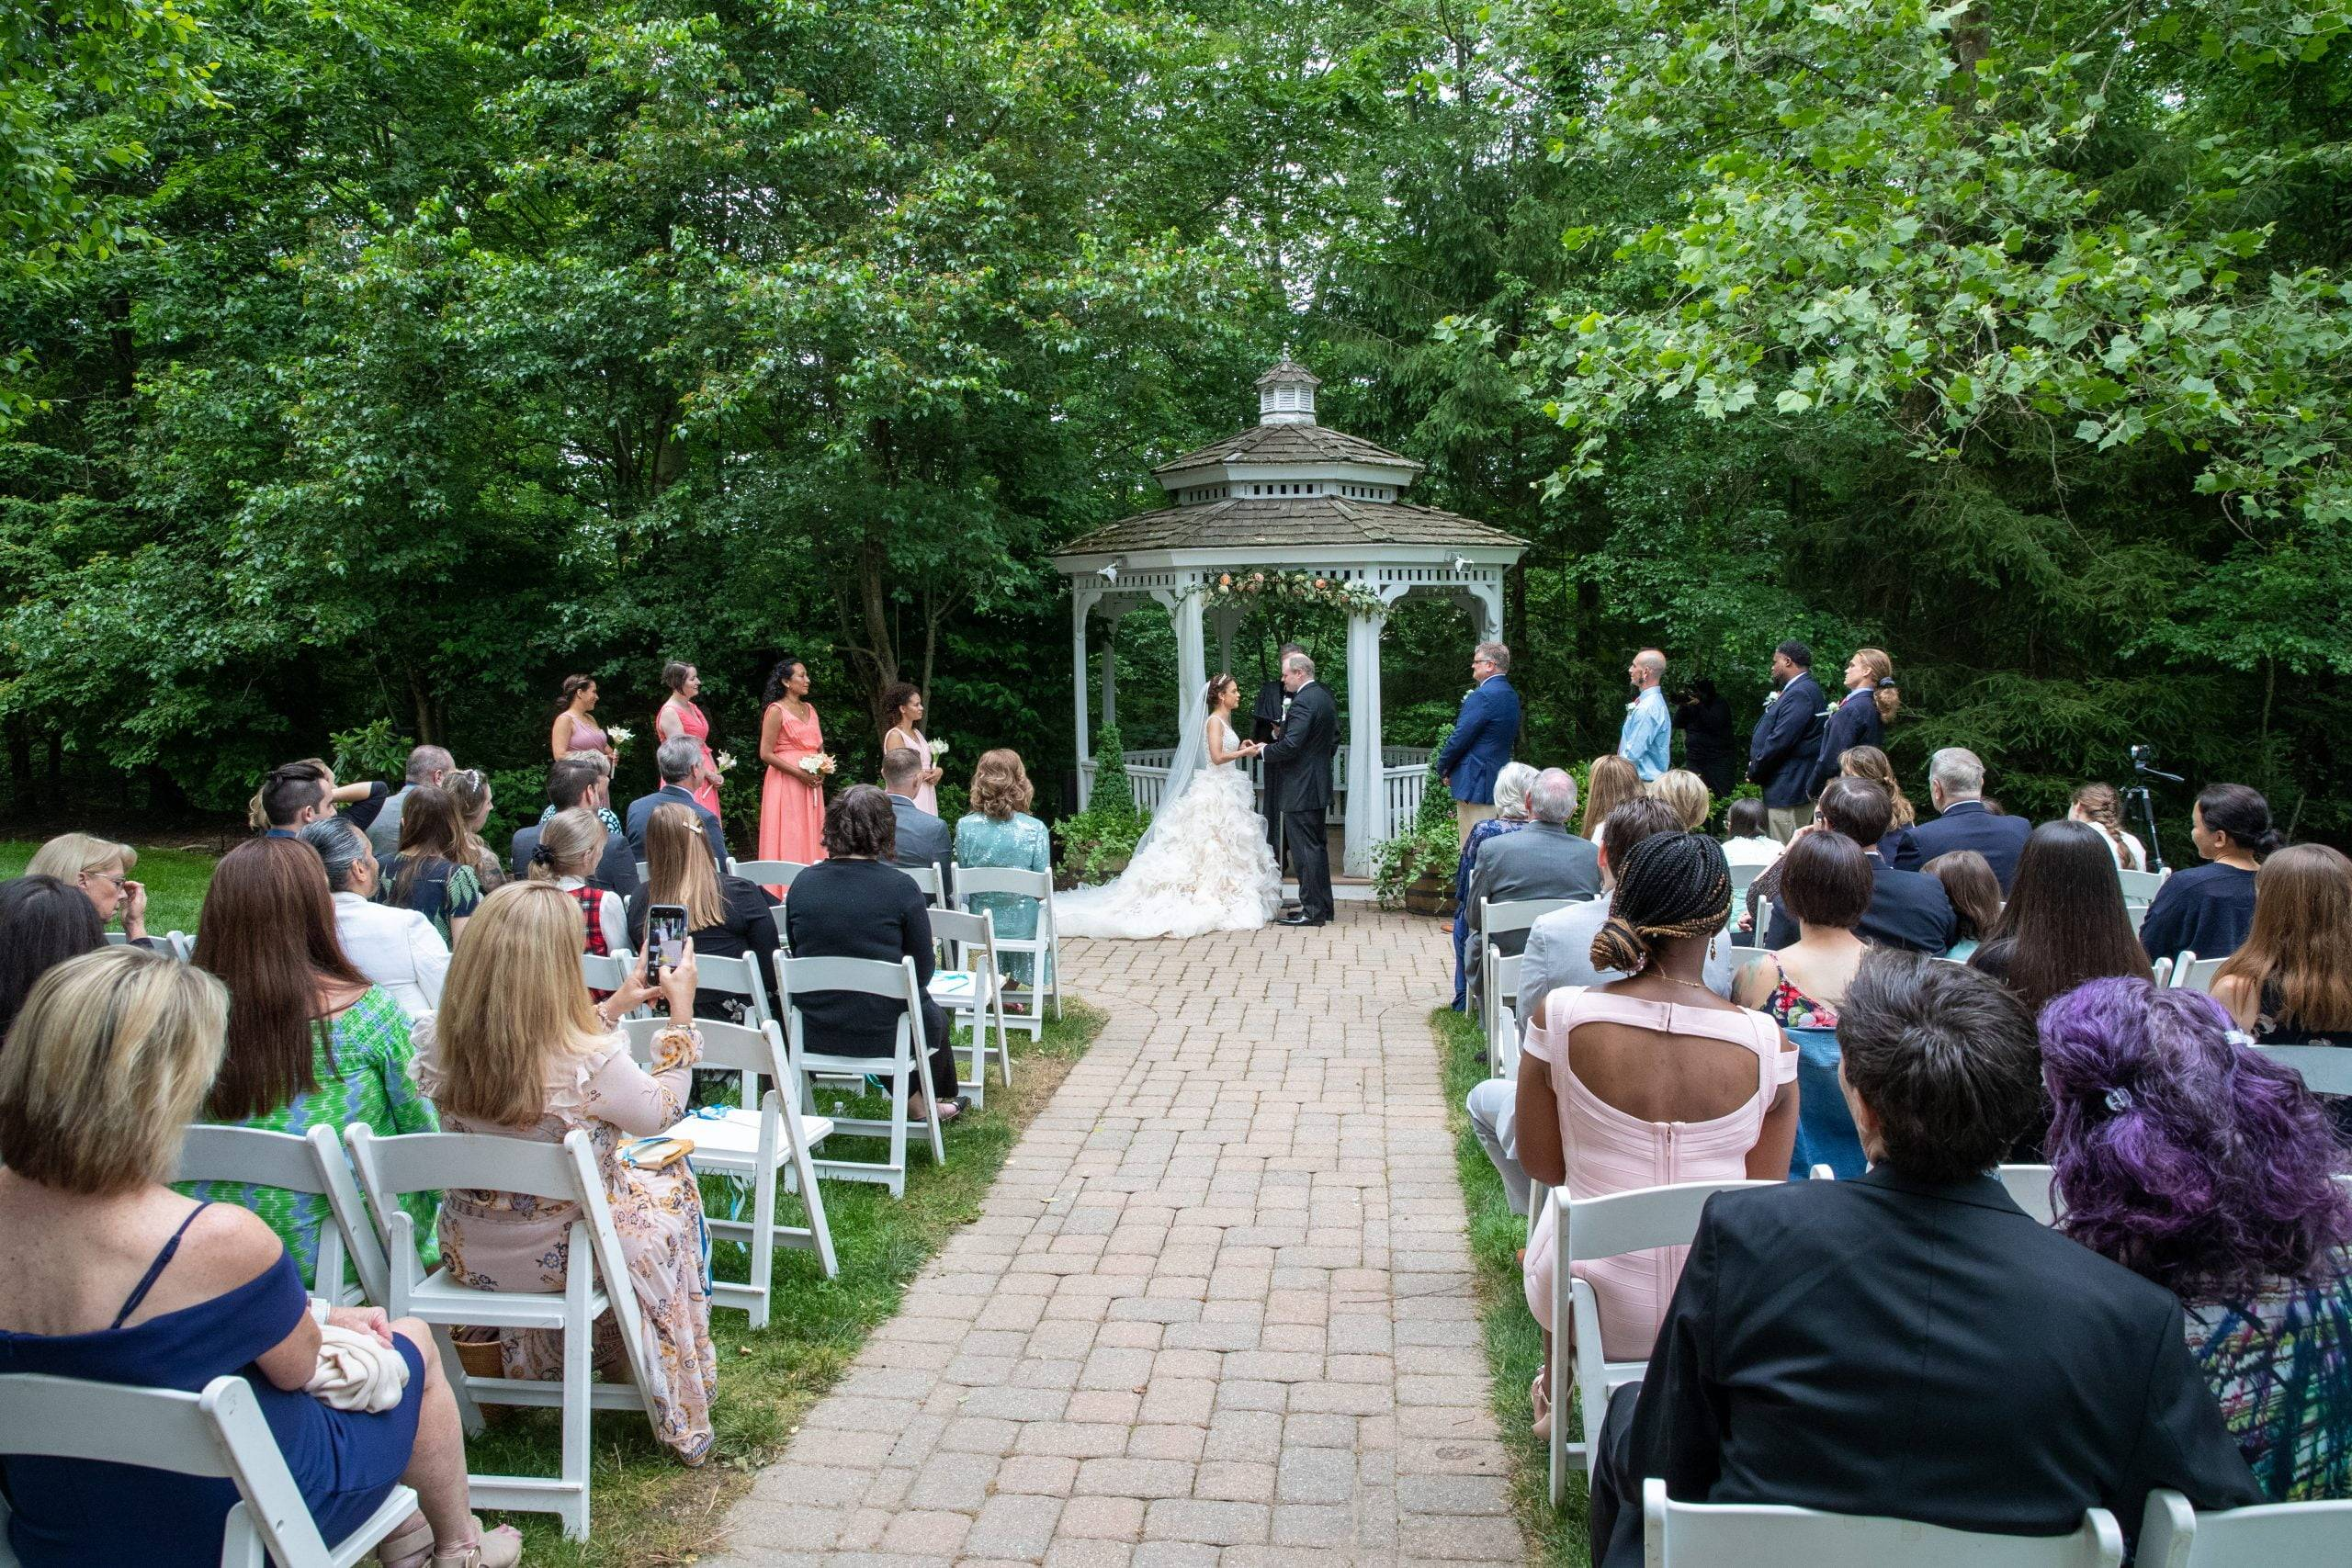 Olde Mill Inn wedding ceremony by gazebo